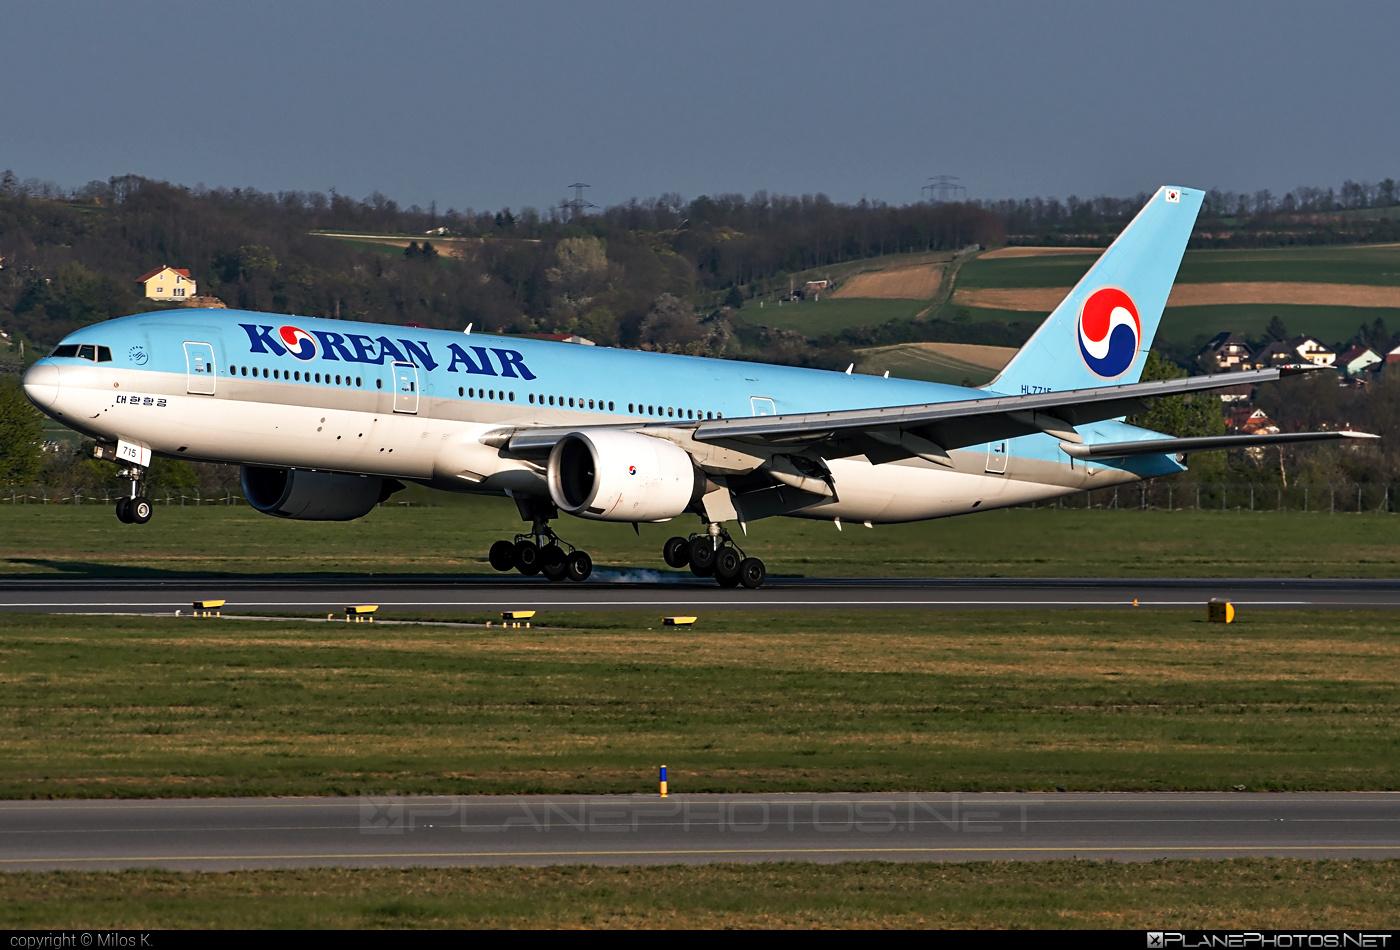 Boeing 777-200ER - HL7715 operated by Korean Air #b777 #b777er #boeing #boeing777 #koreanair #tripleseven